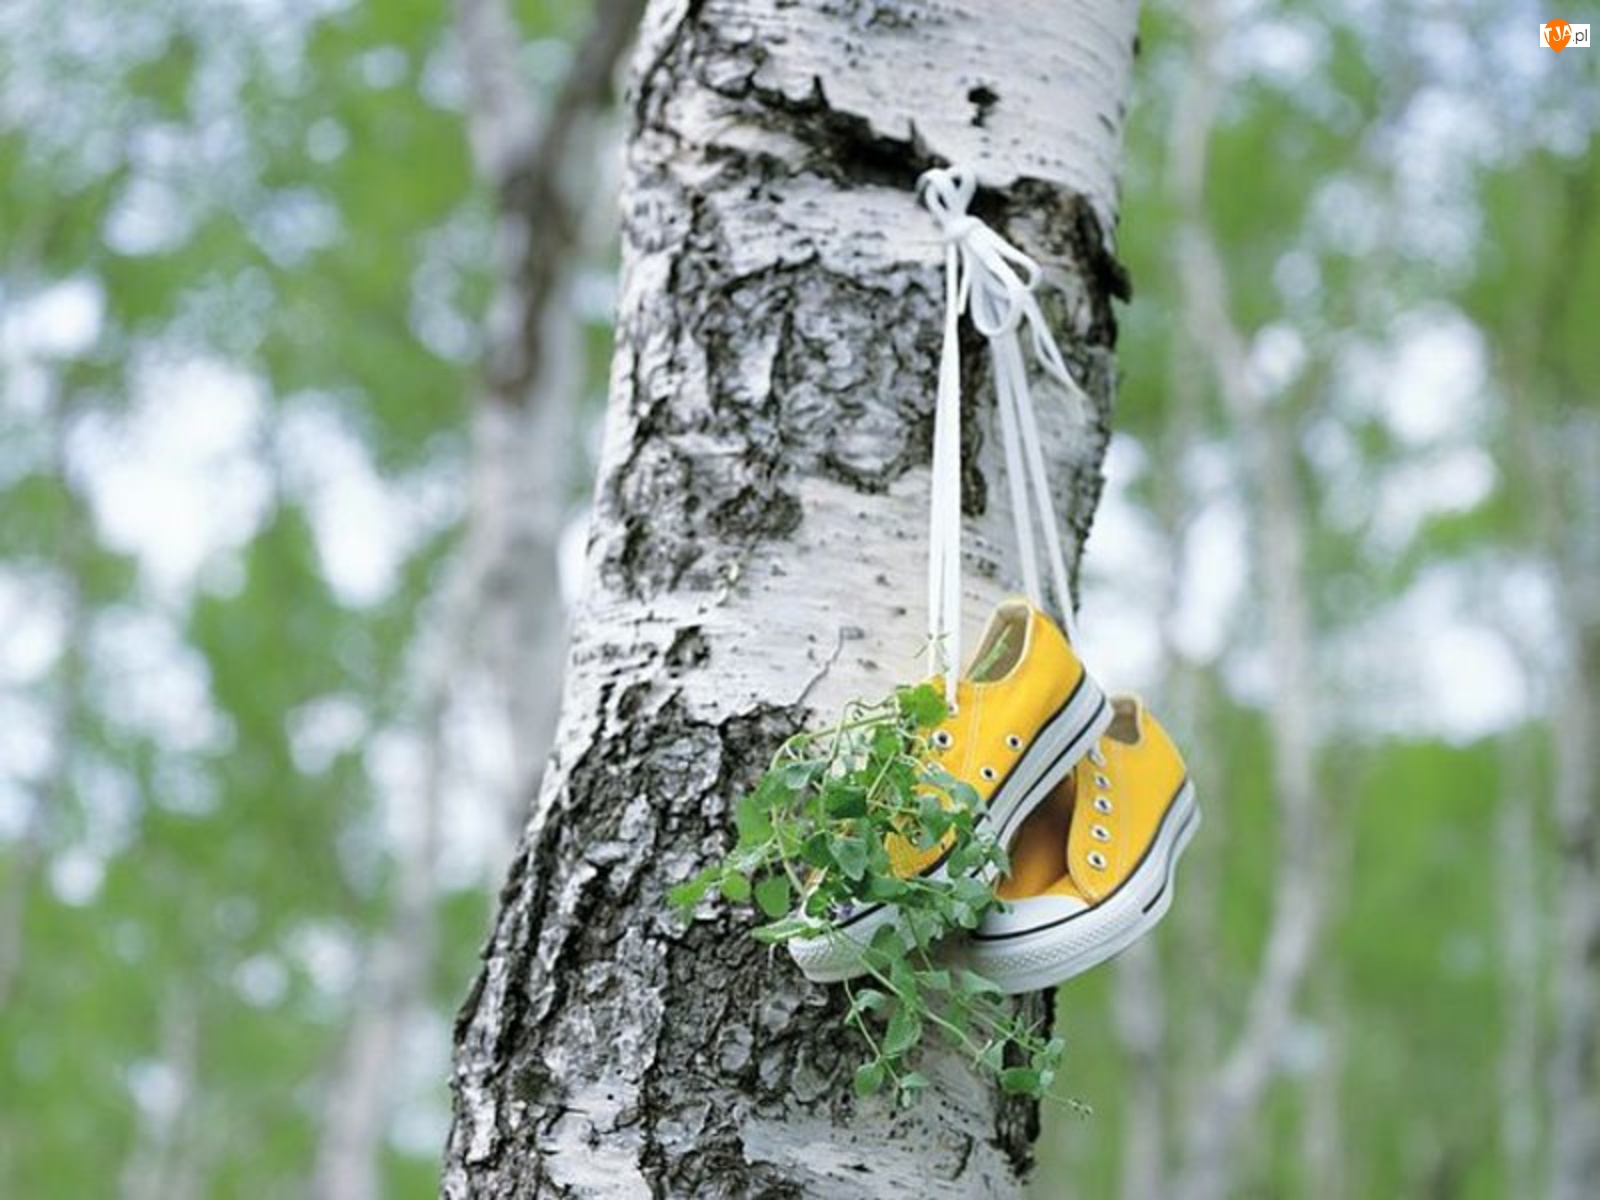 Trampki, Drzewo, Brzoza